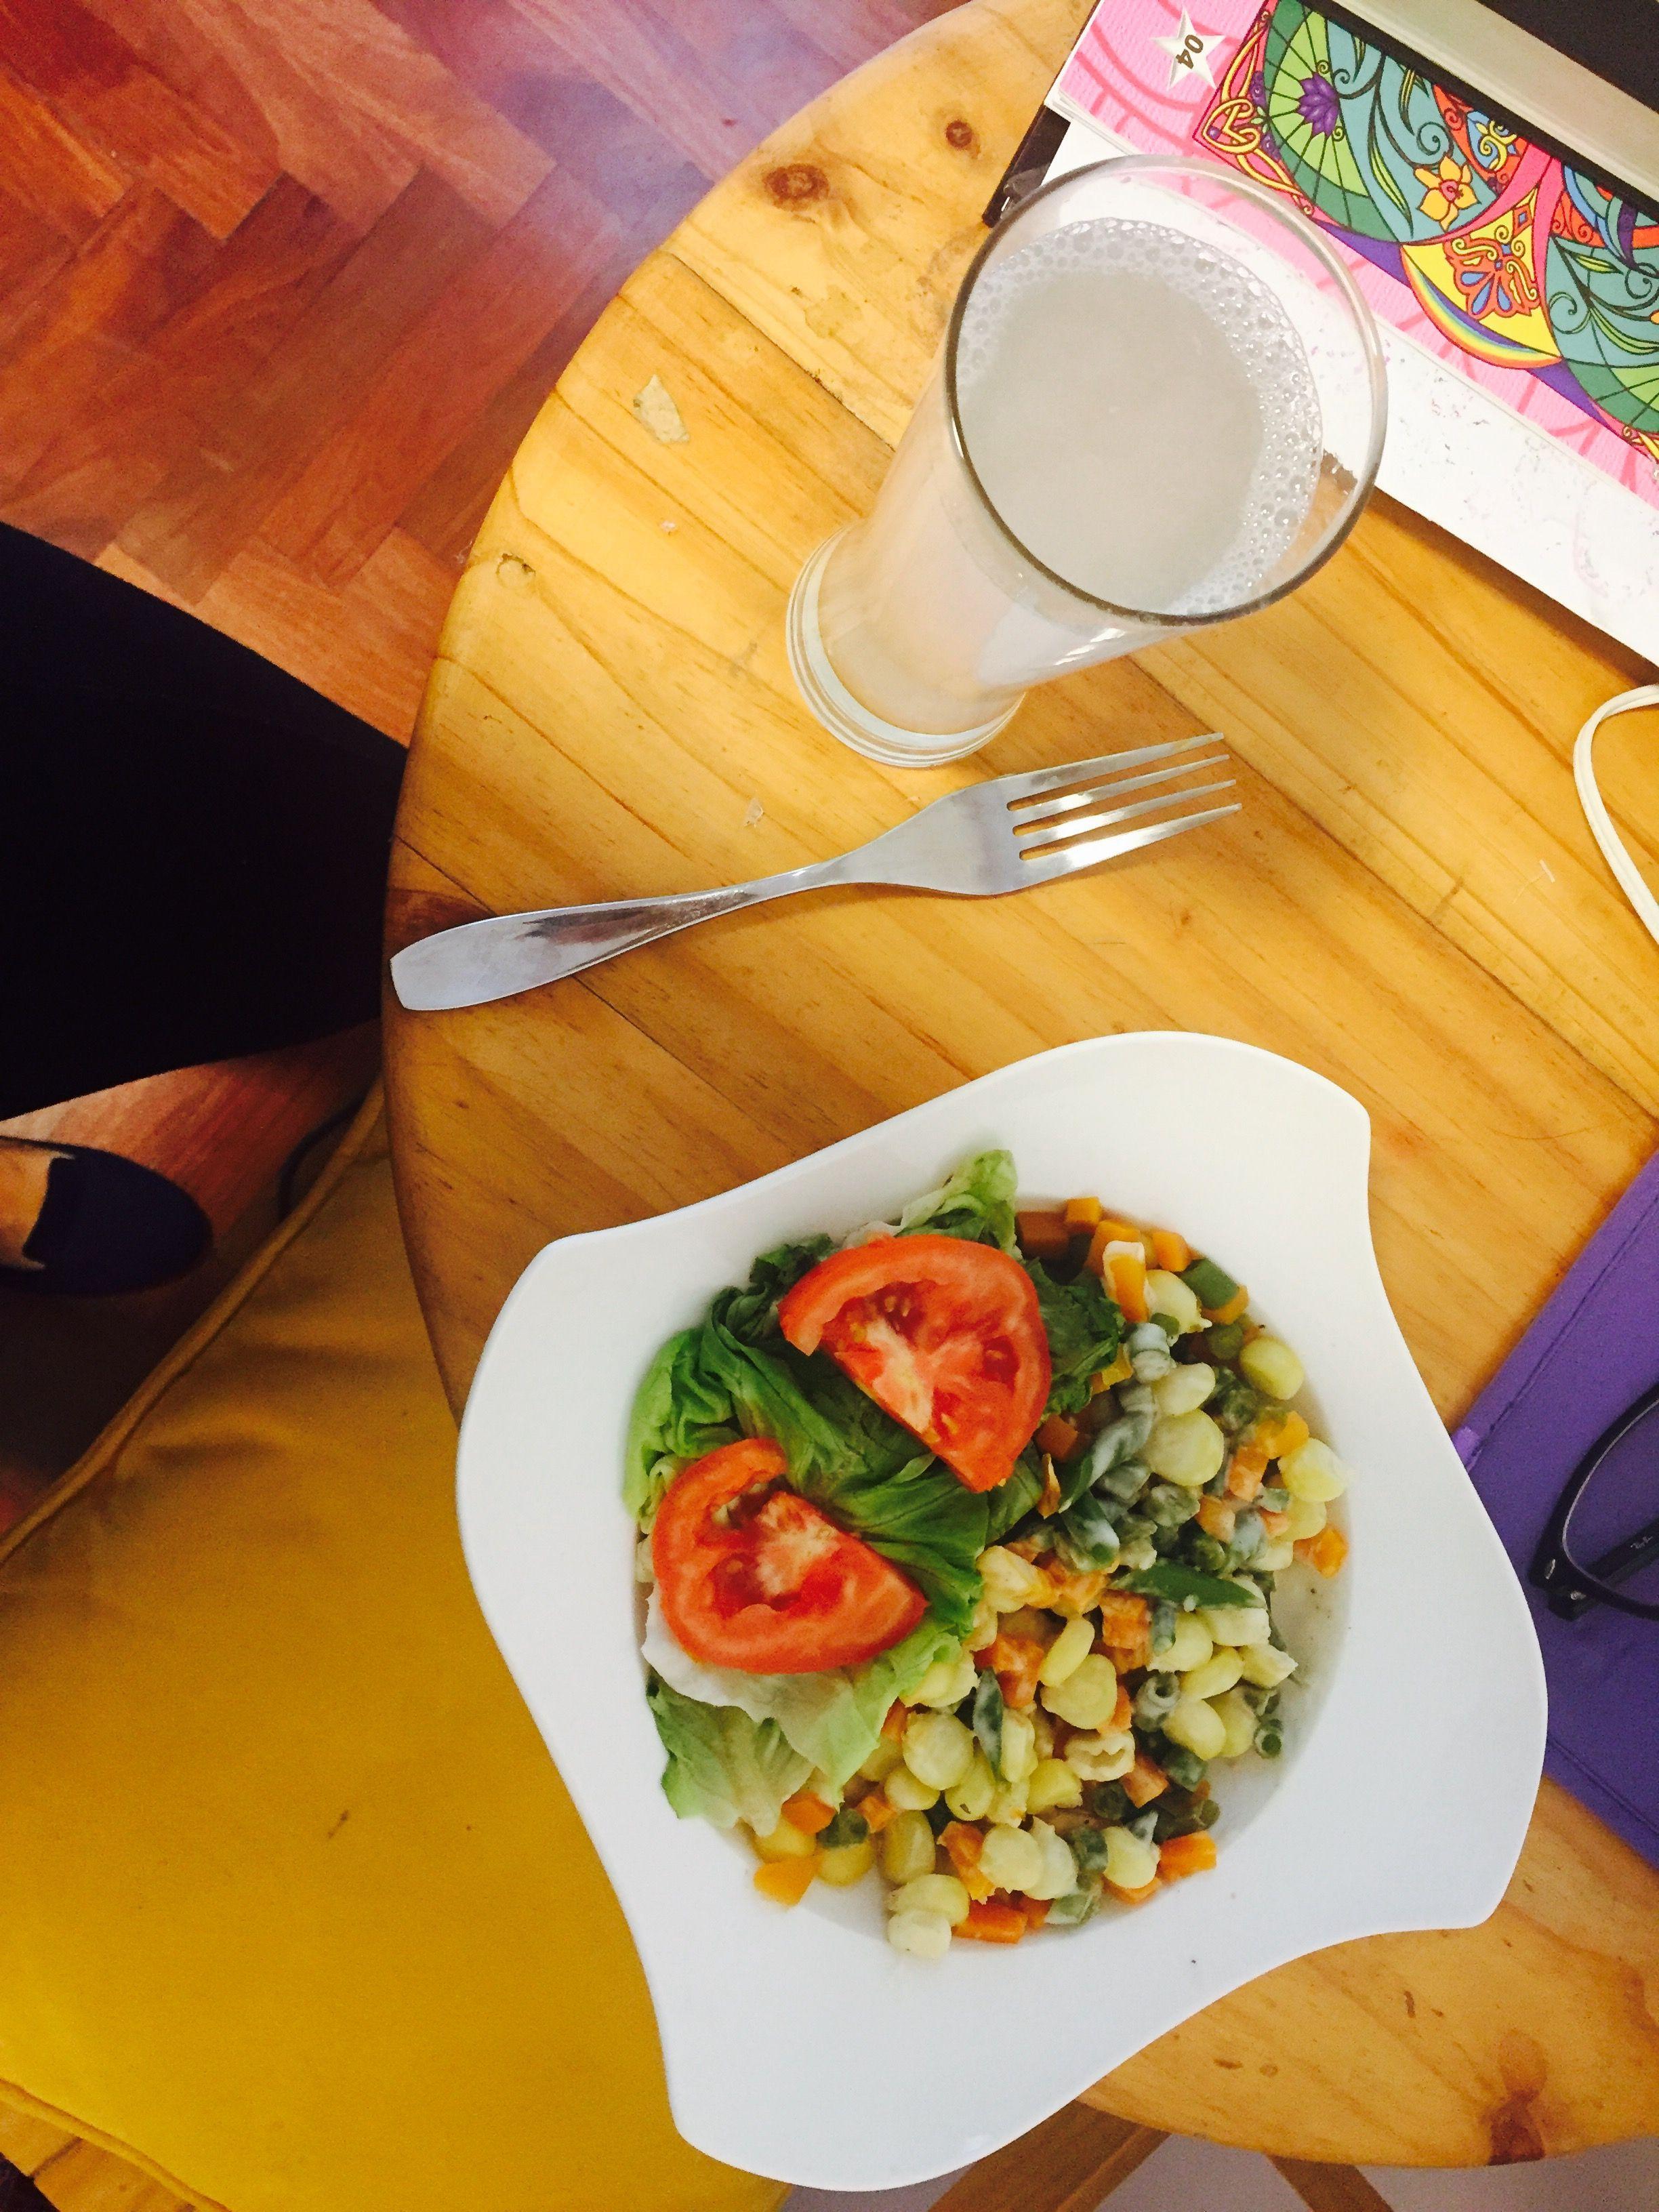 ❤️ amoooo!! La ensalada 🥗